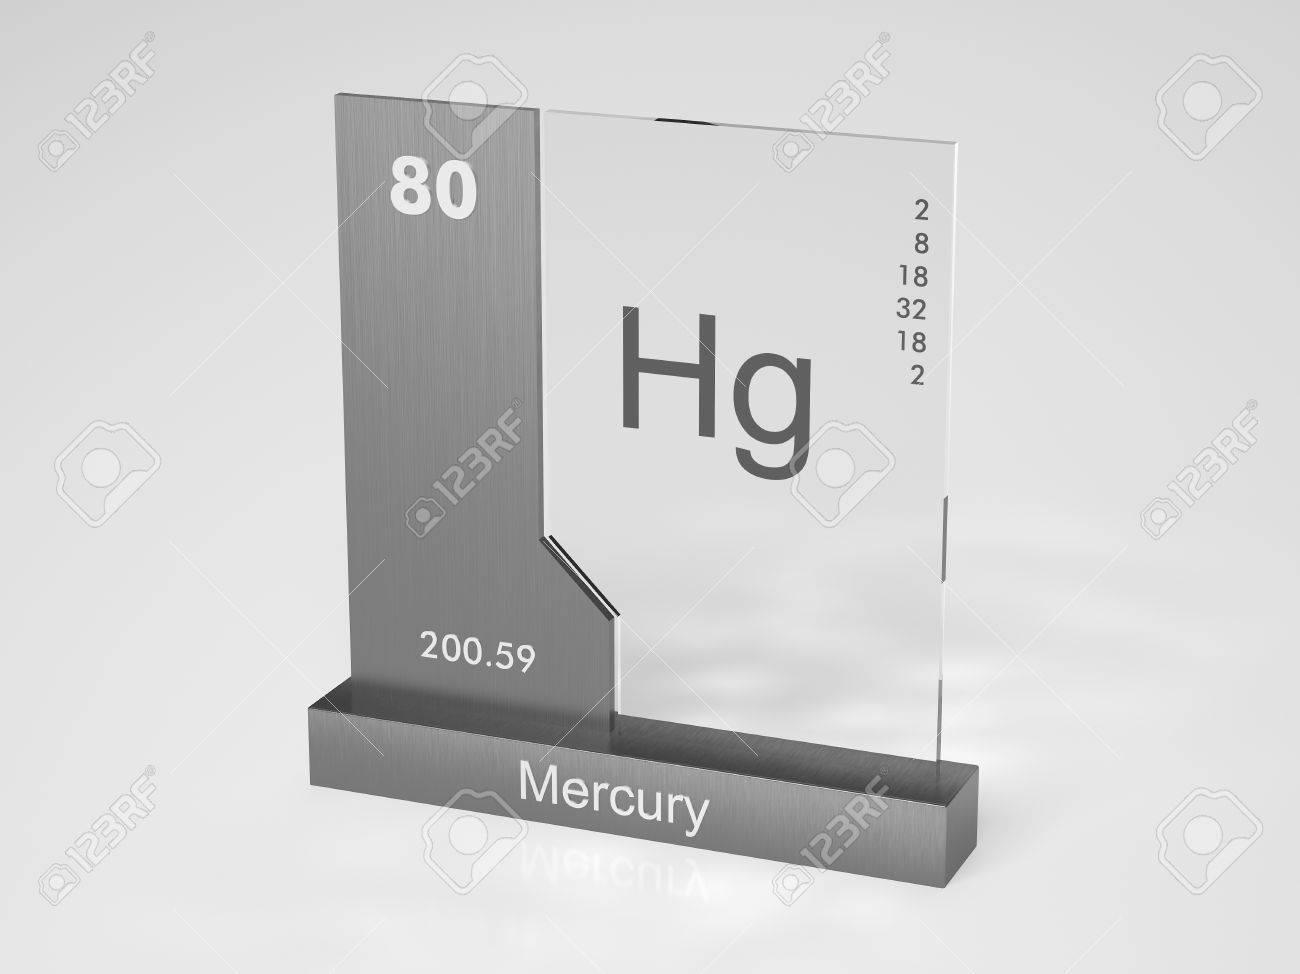 Elemento qumico mercurio smbolo hg de la tabla peridica fotos elemento qumico mercurio smbolo hg de la tabla peridica foto de archivo 10569401 urtaz Image collections